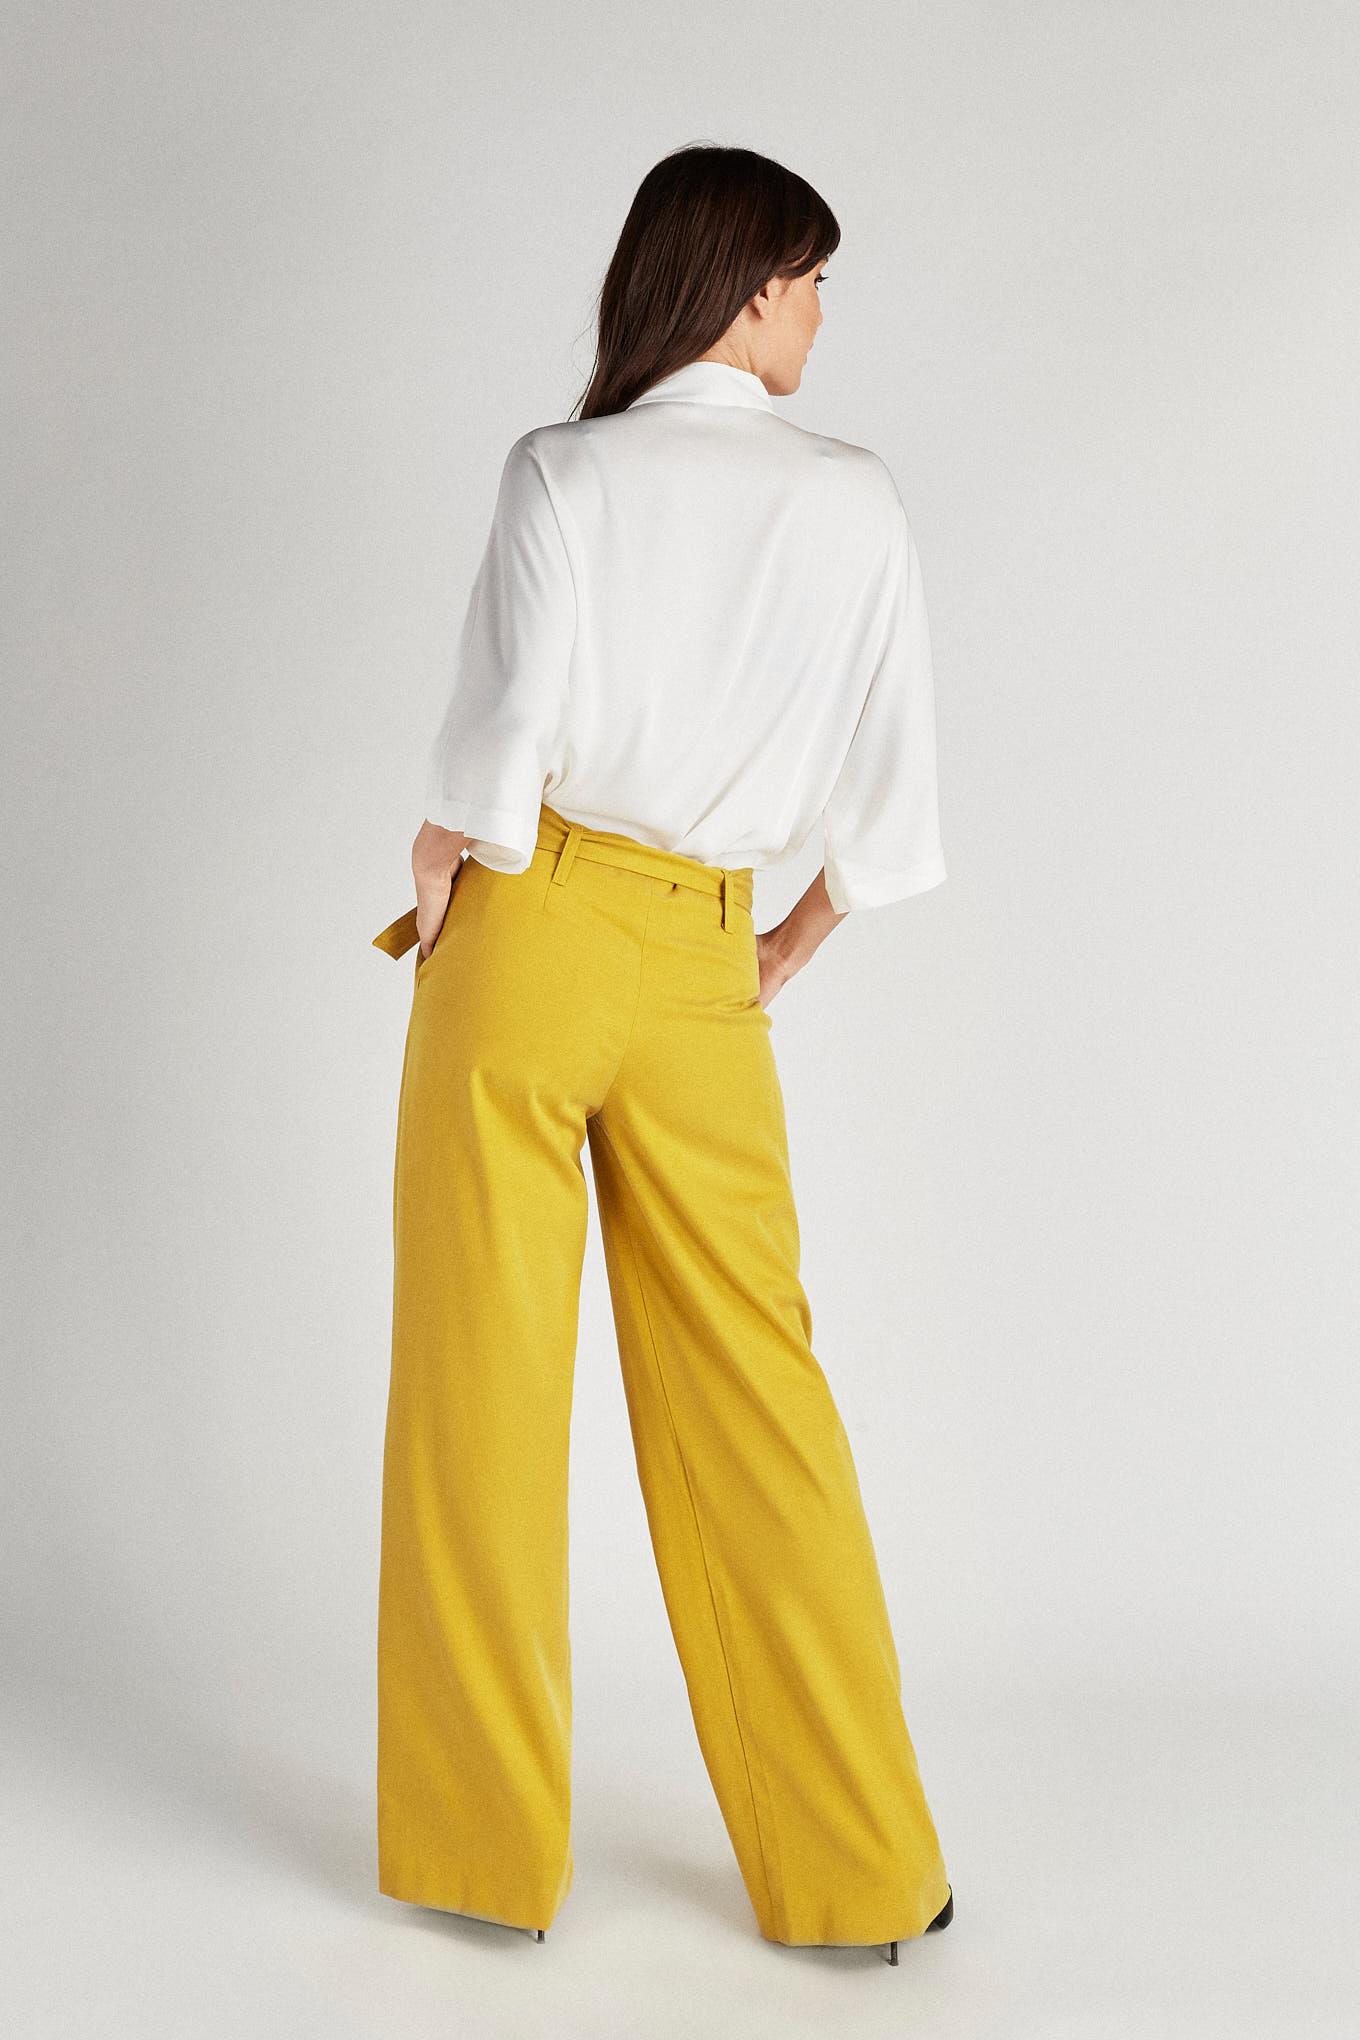 Trousers Yellow Fantasy Woman